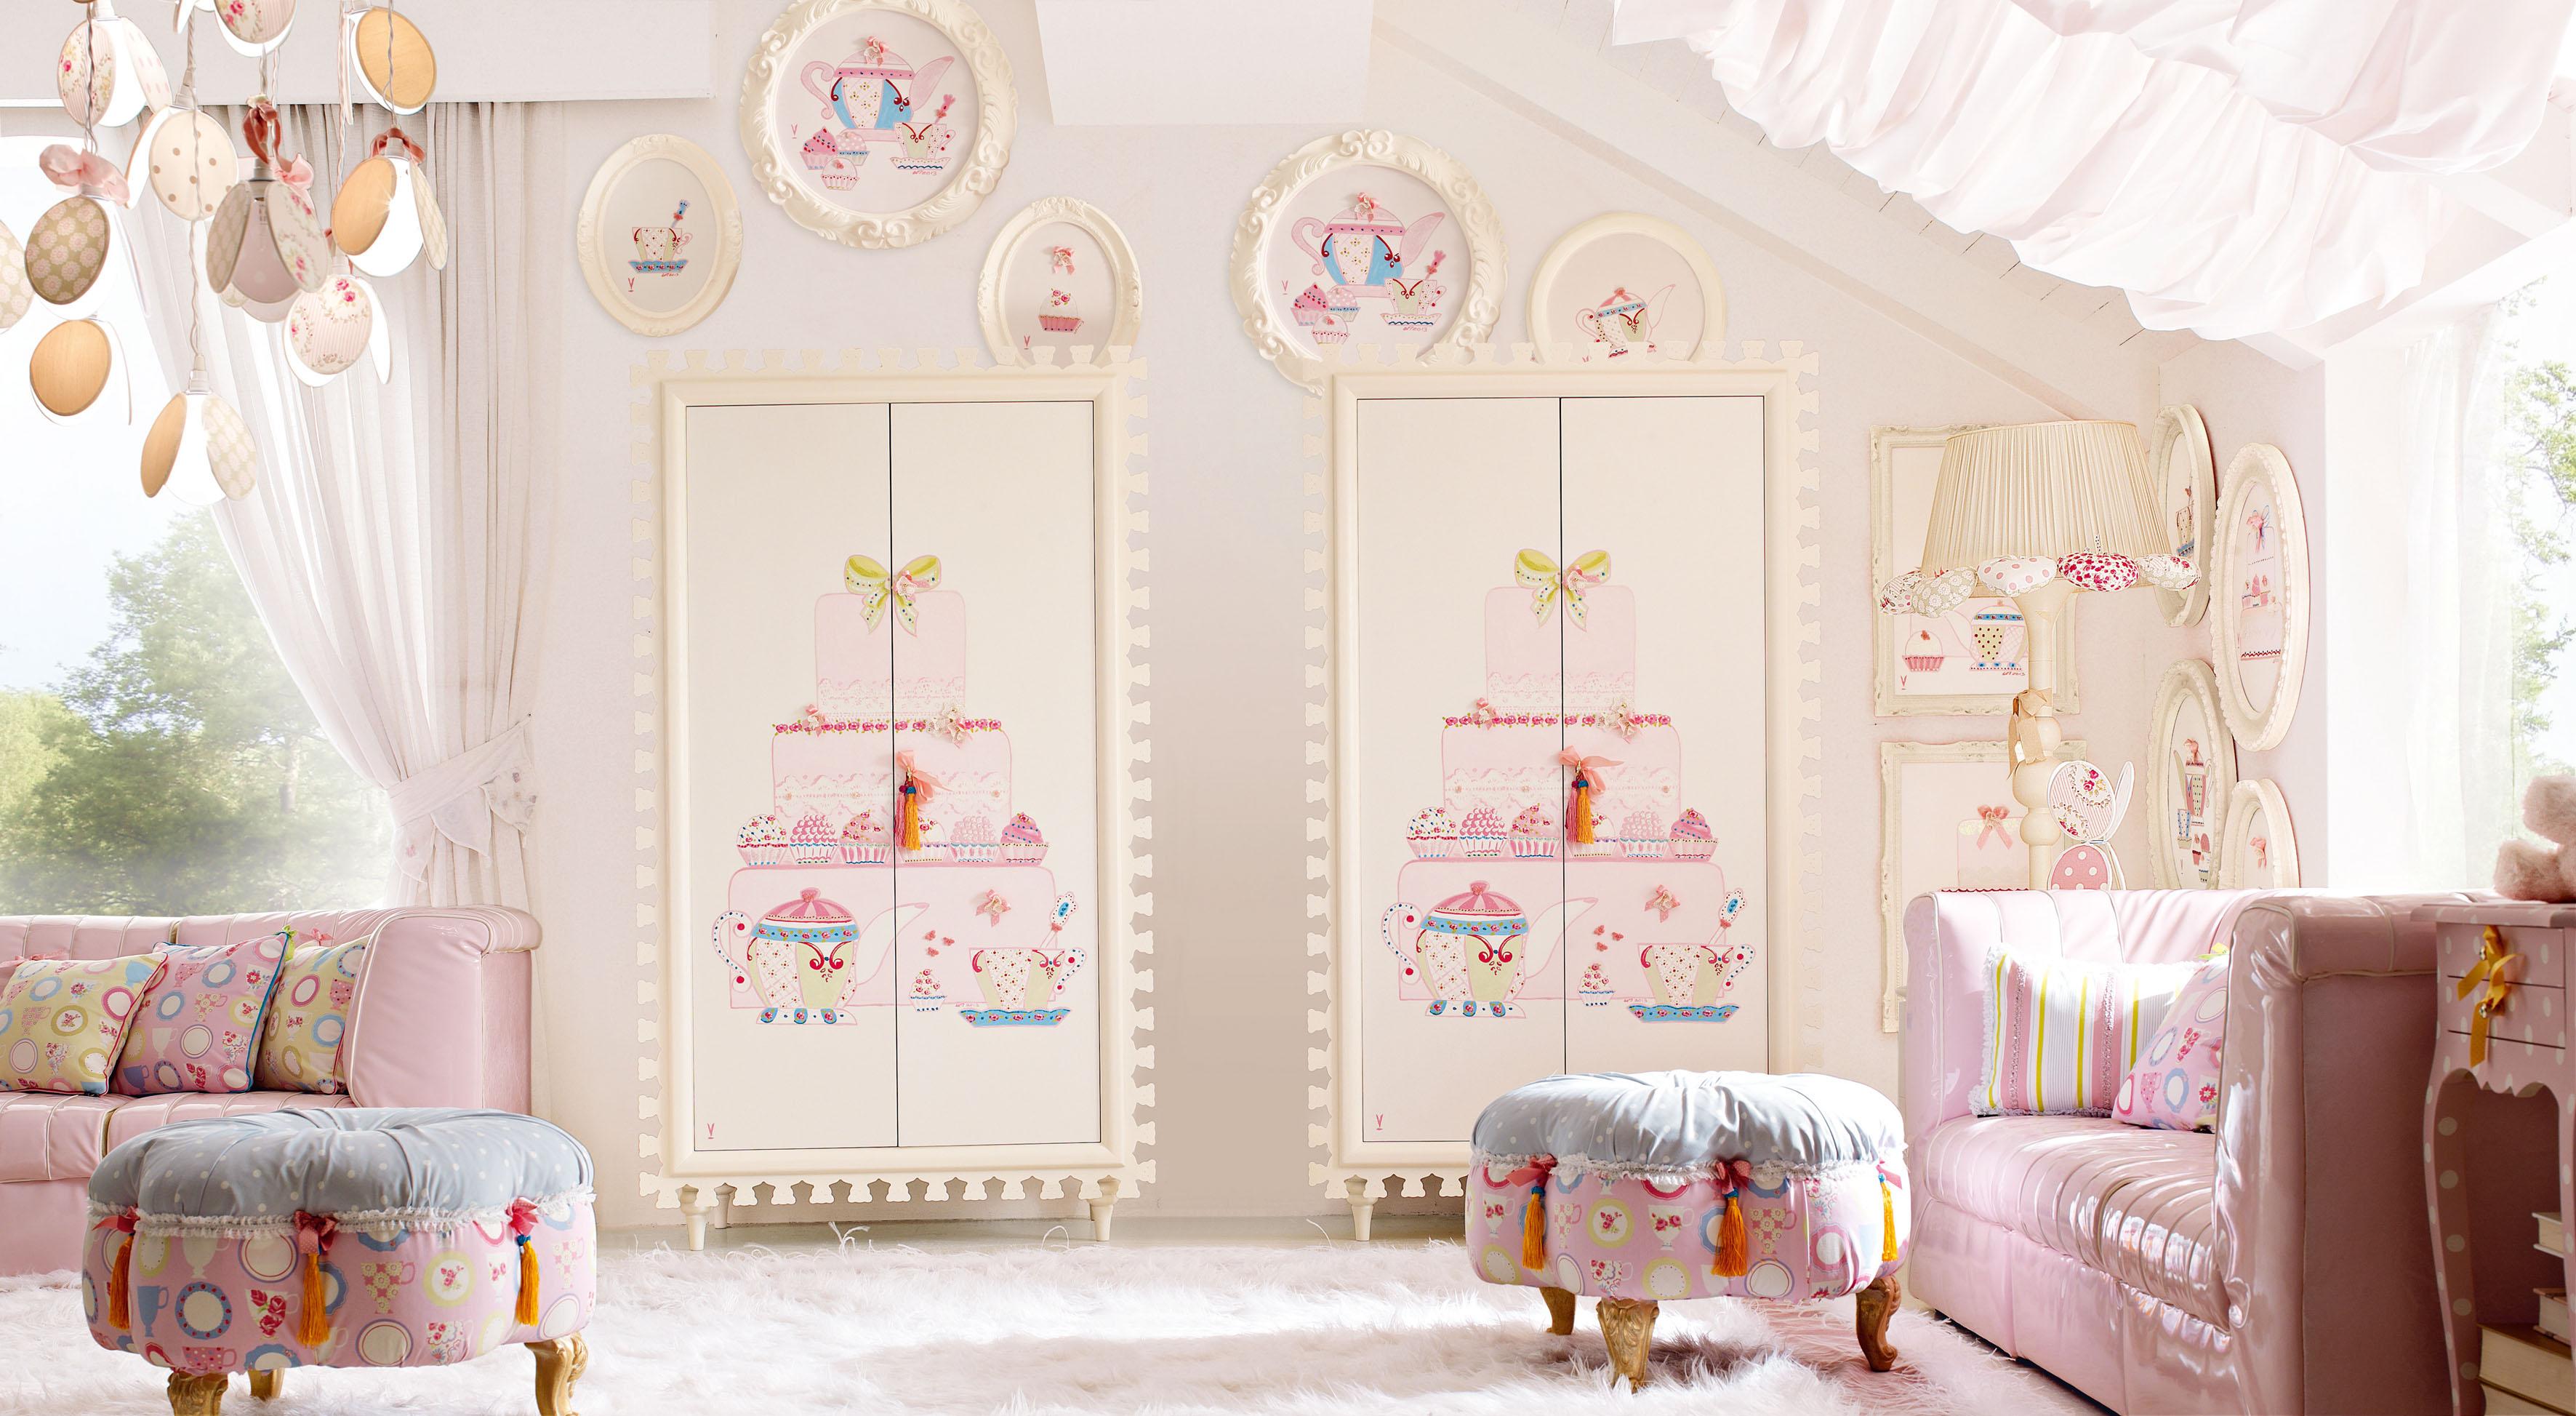 NEW ALTAMODA ITALIA COLLECTIONS   White Childrenu0027s Room With Pop Up  Colours. Toy Train | Cute Childrenu0027s Rooms U0026 Nurseries | Pinterest |  Italia, ...